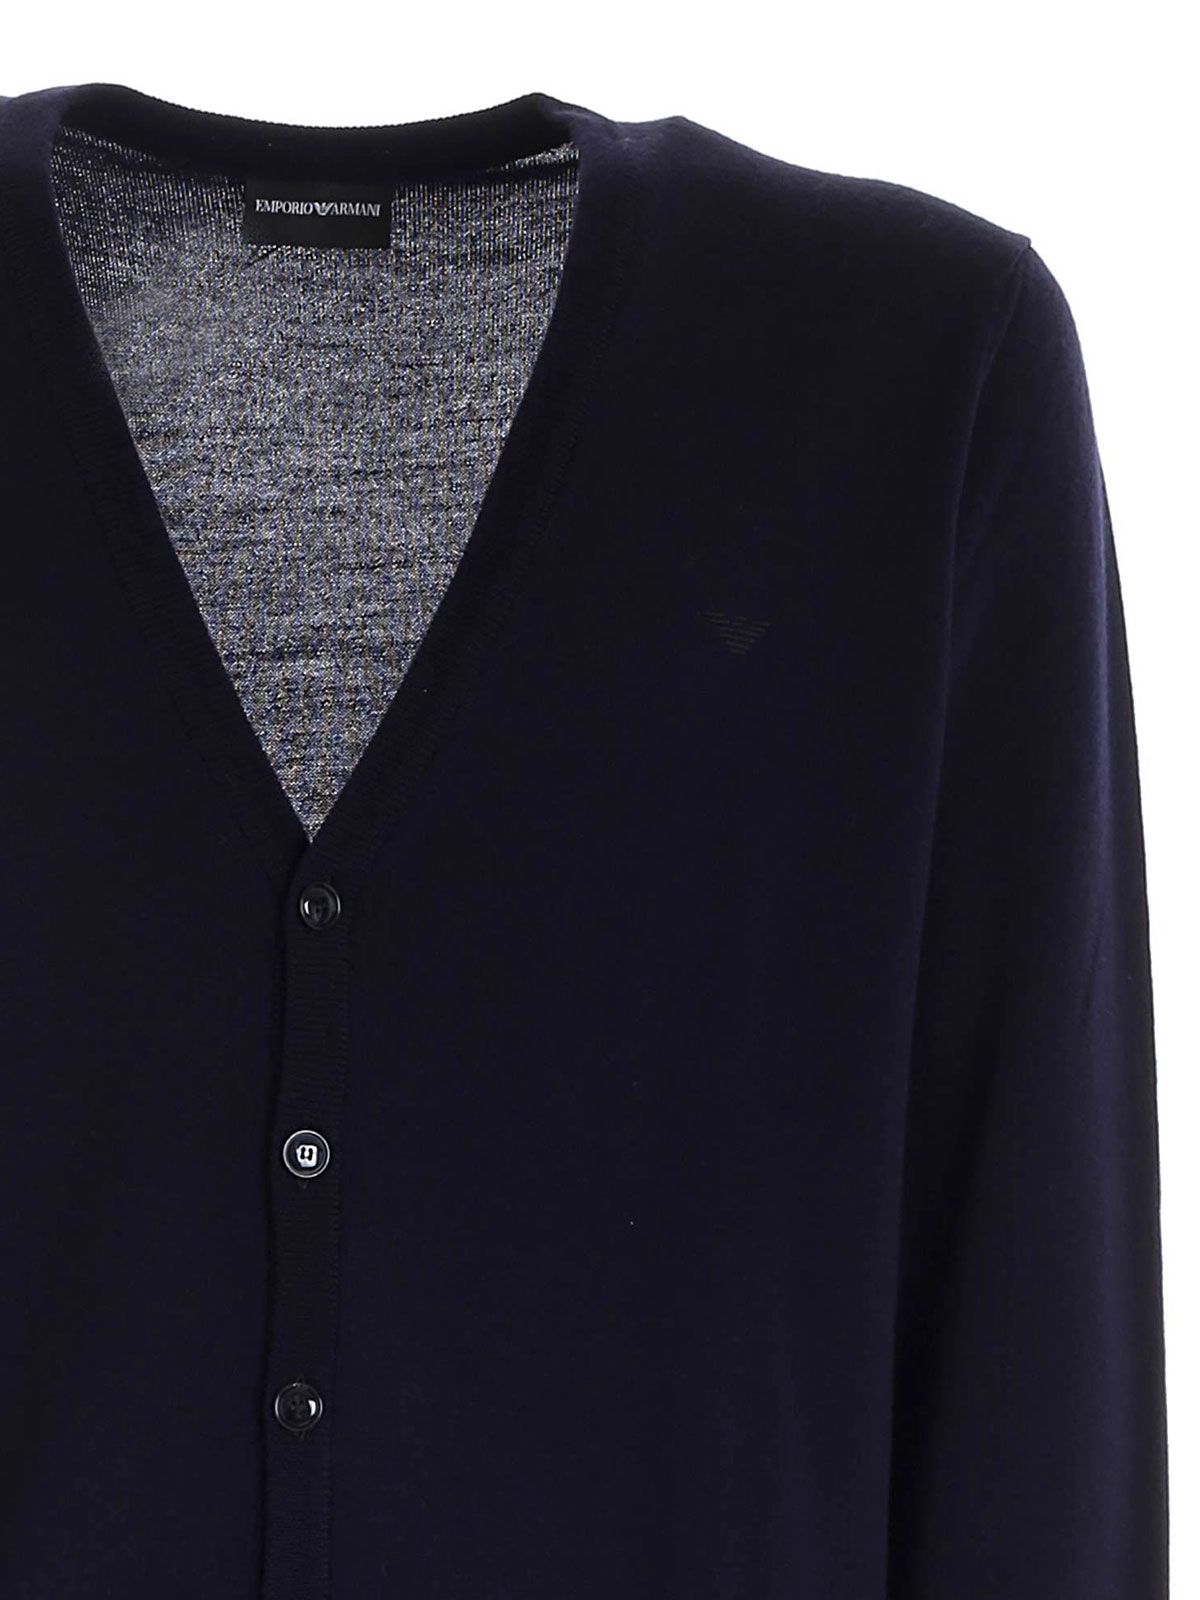 Picture of EMPORIO ARMANI | Men's Virgin Wool Cardigan